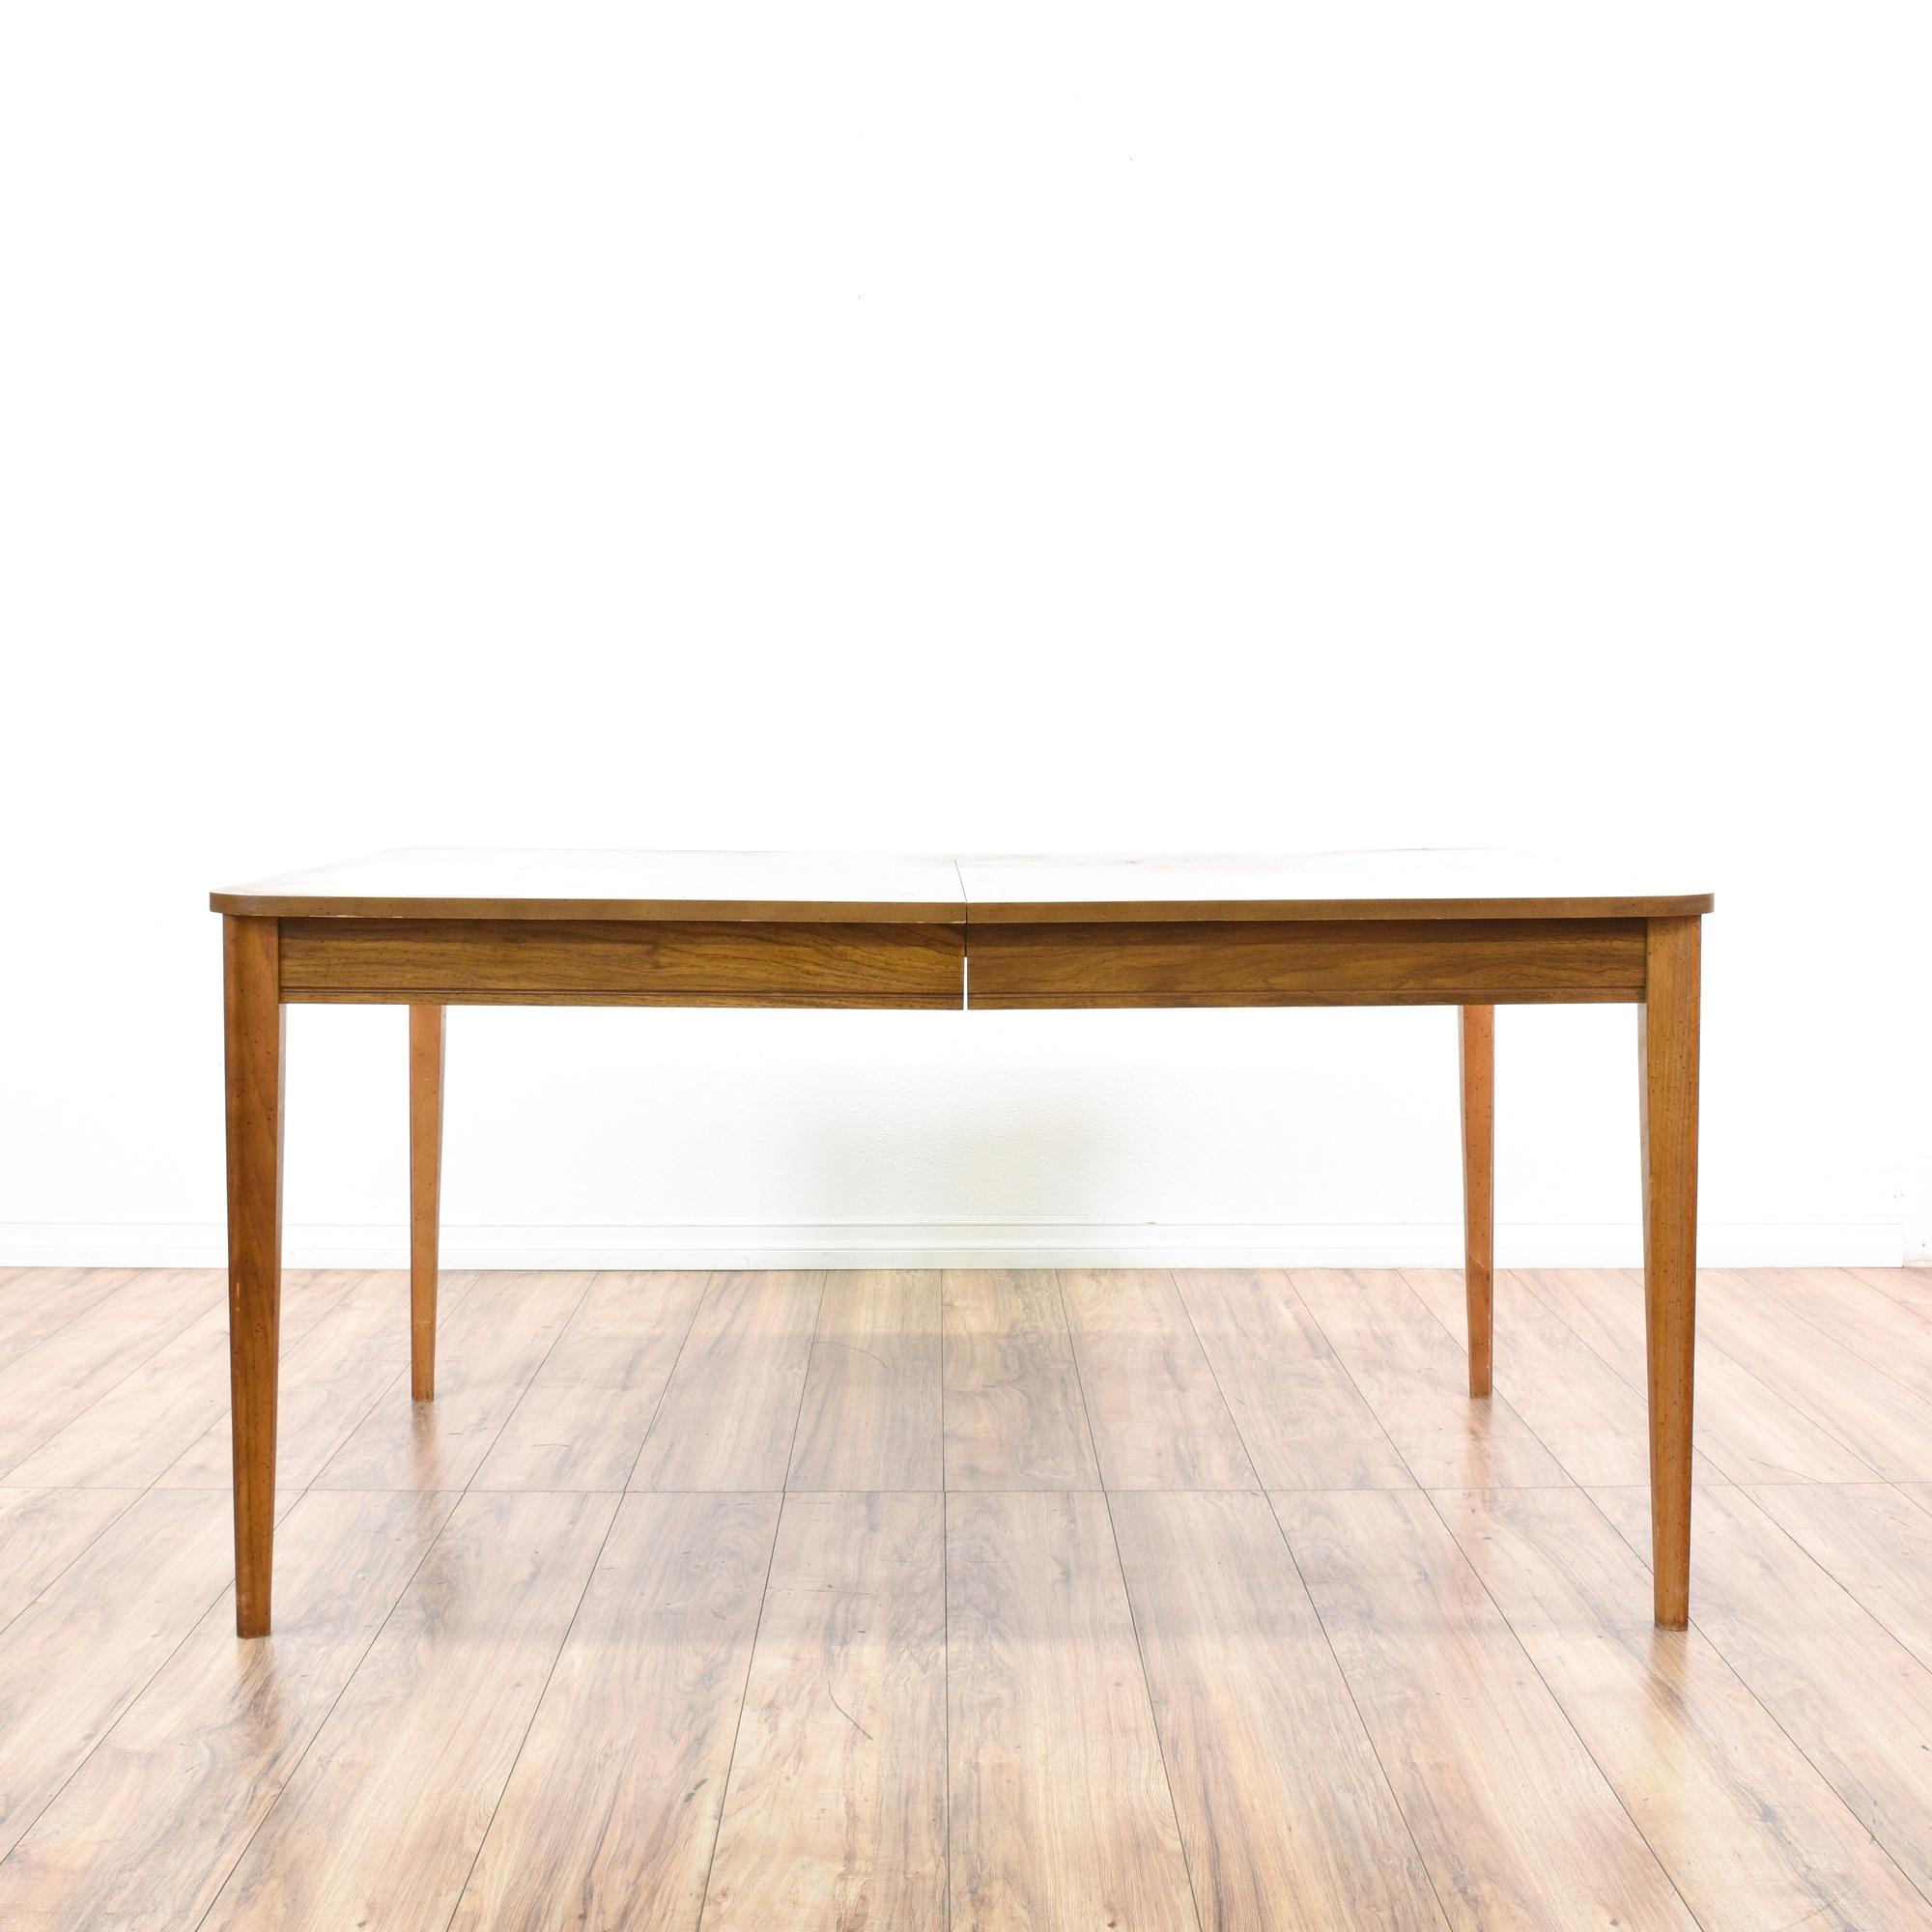 Bassett mid century modern dining table loveseat for Mid century modern la